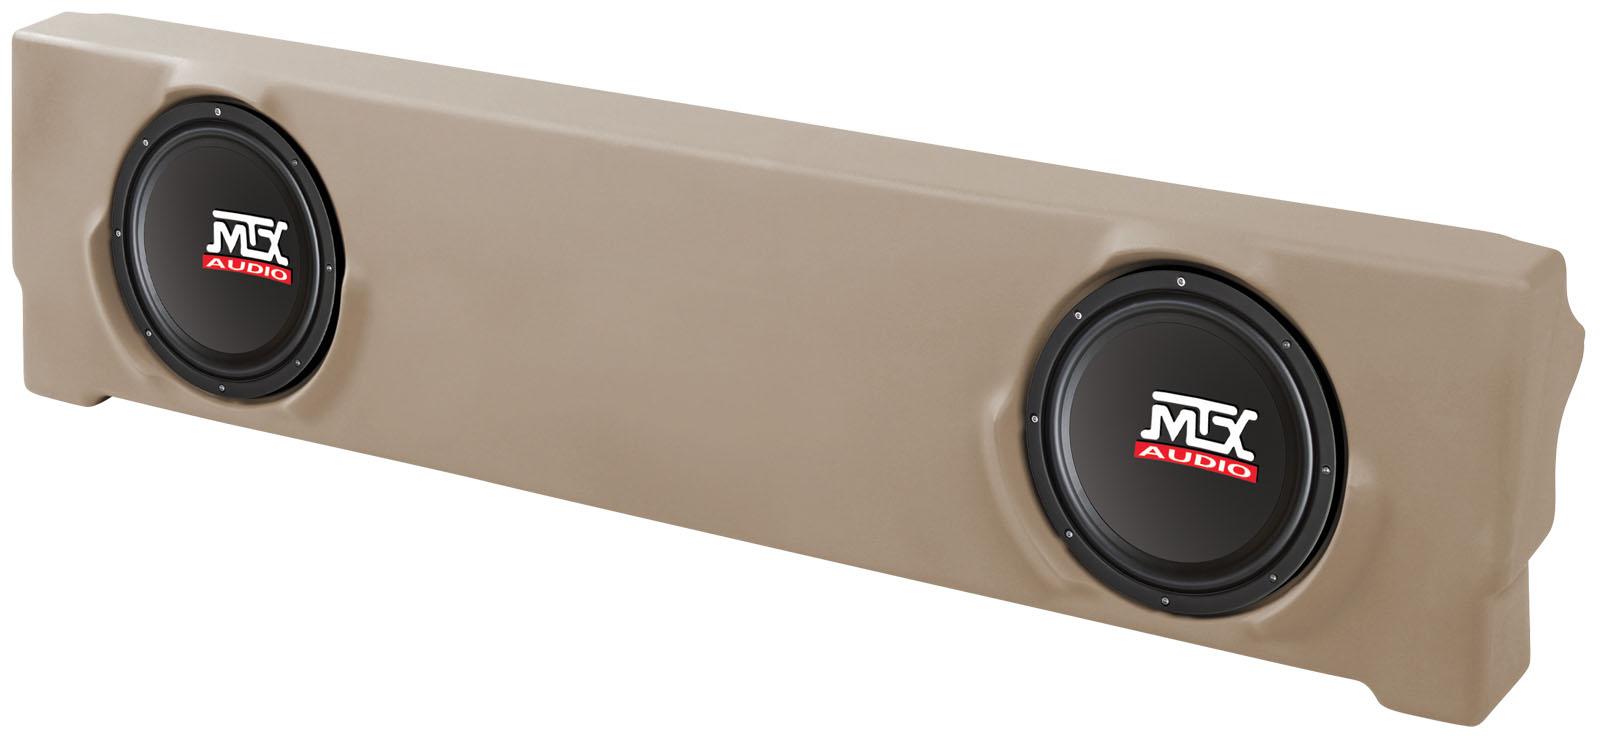 C25hc00t20 Tn Thunderform Custom Subwoofer Enclosure Mtx Audio